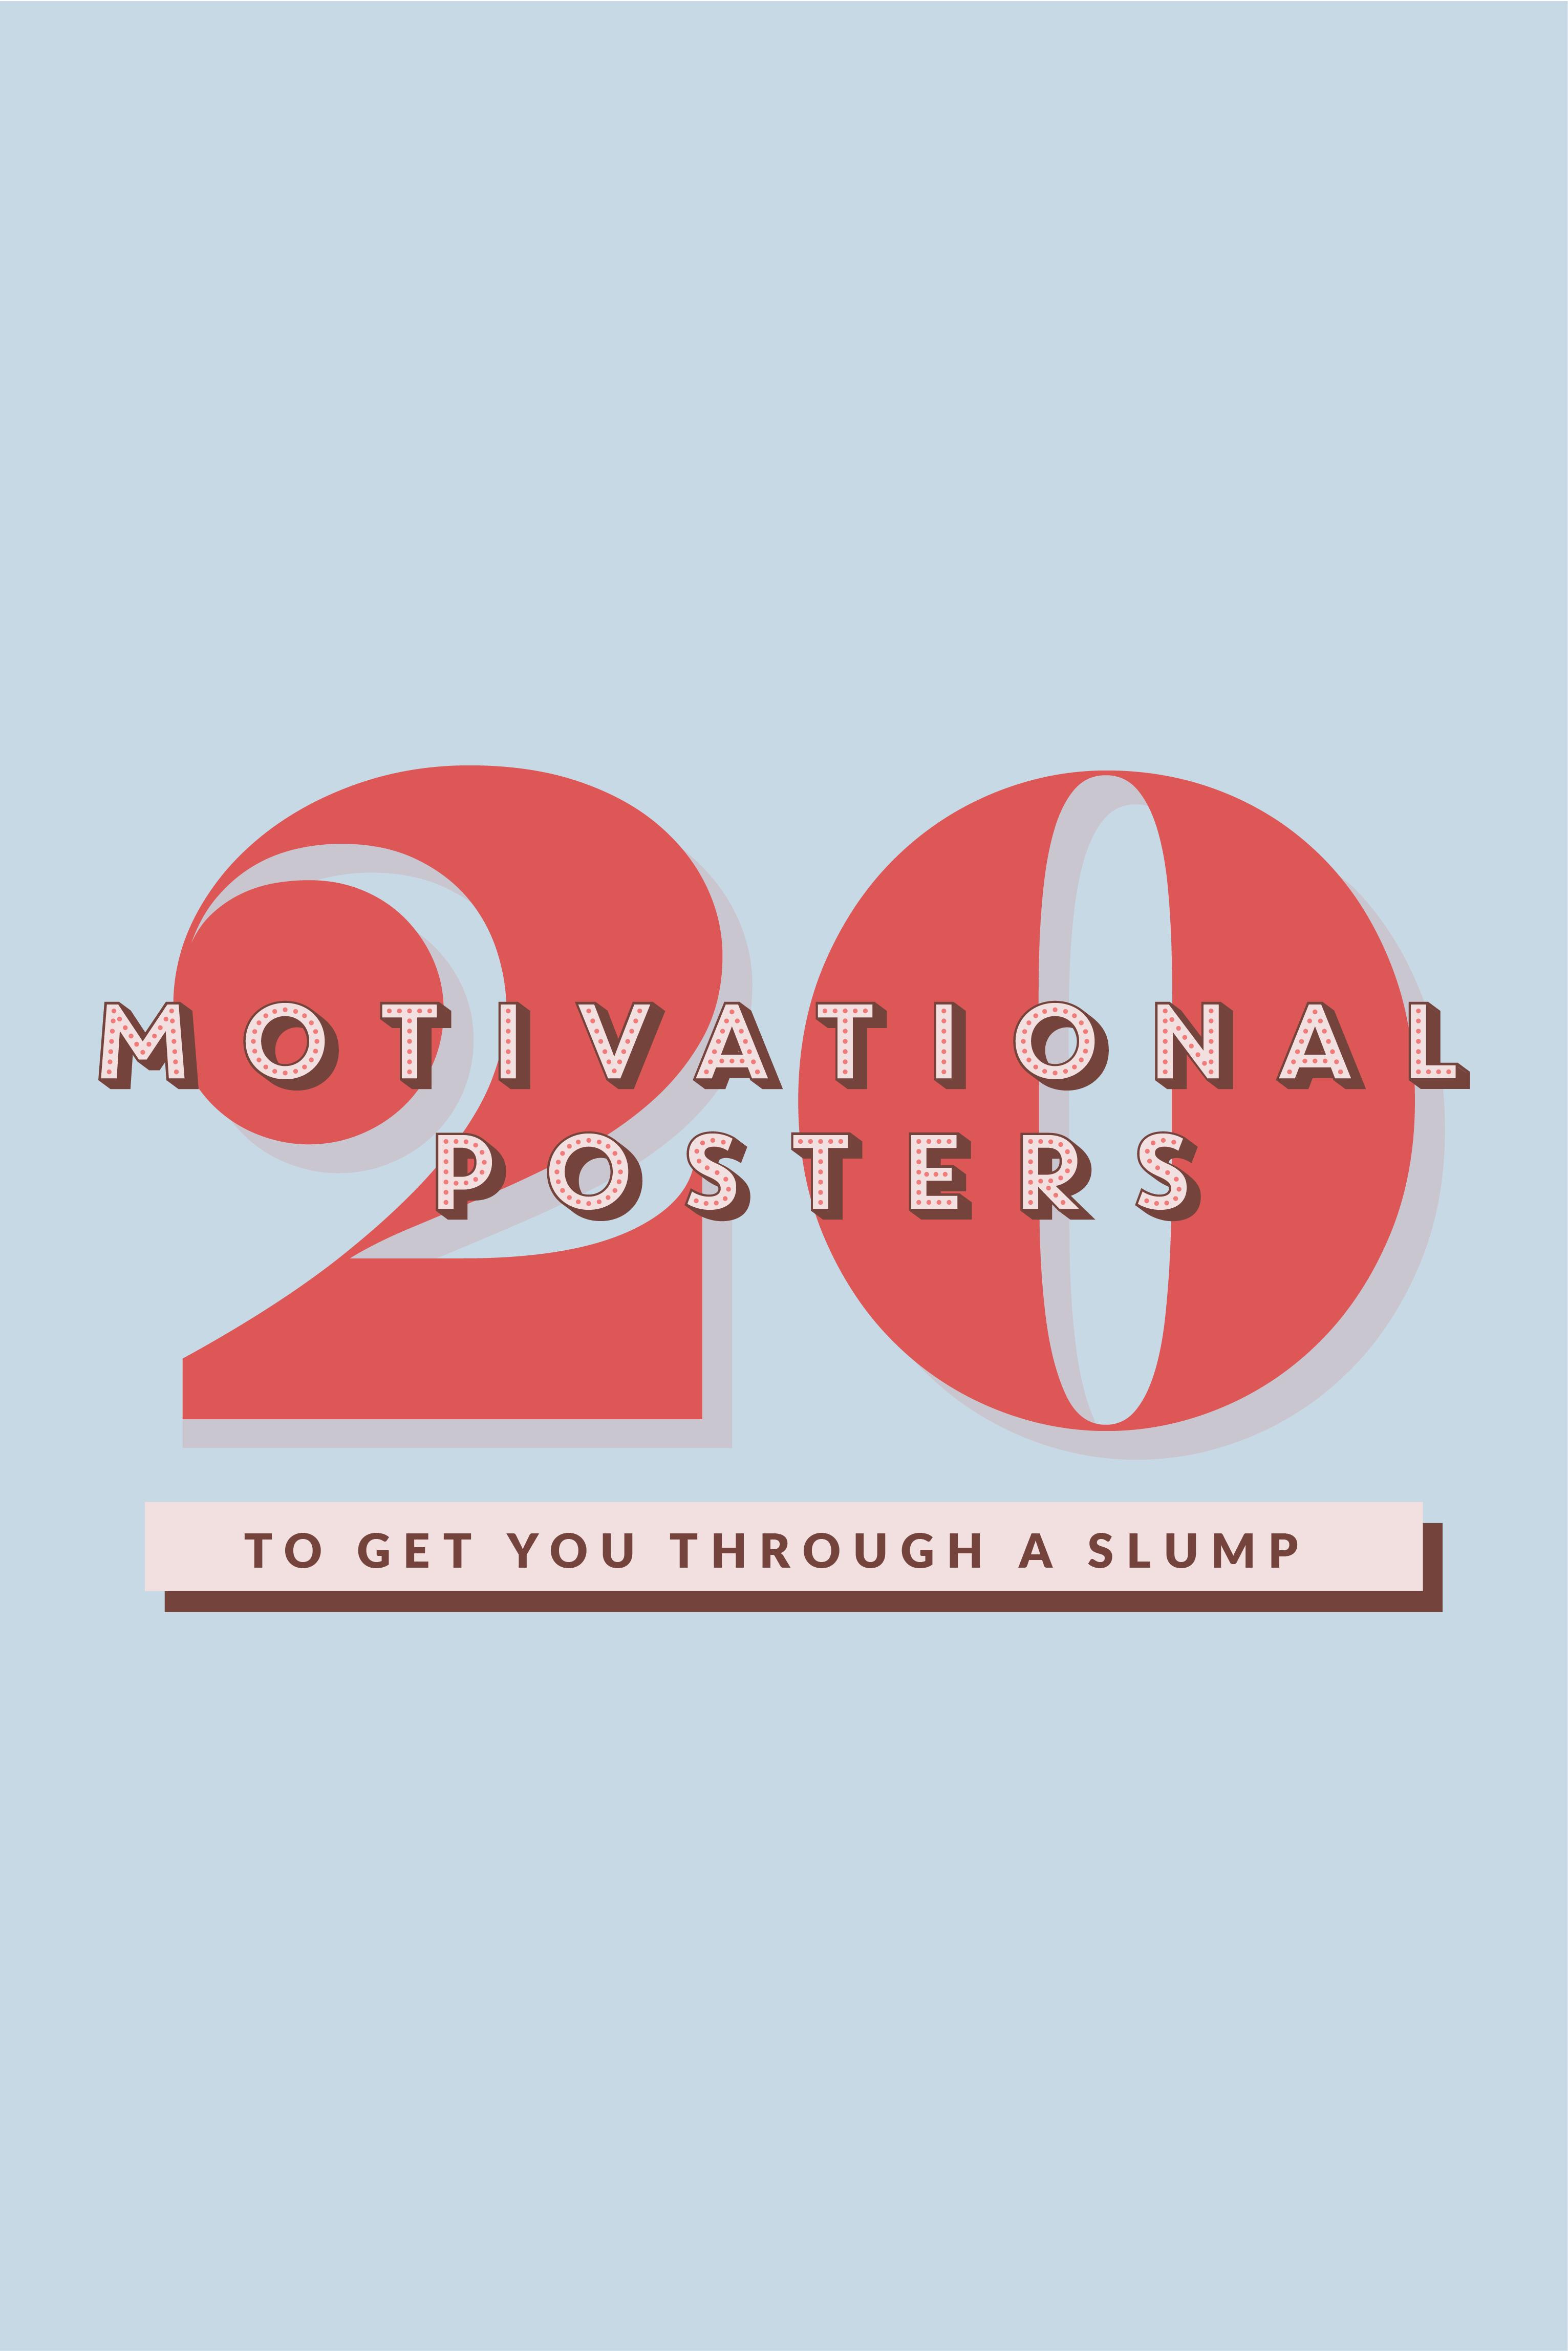 20 Motivational Posters To Get You Through A Slump Pinterest